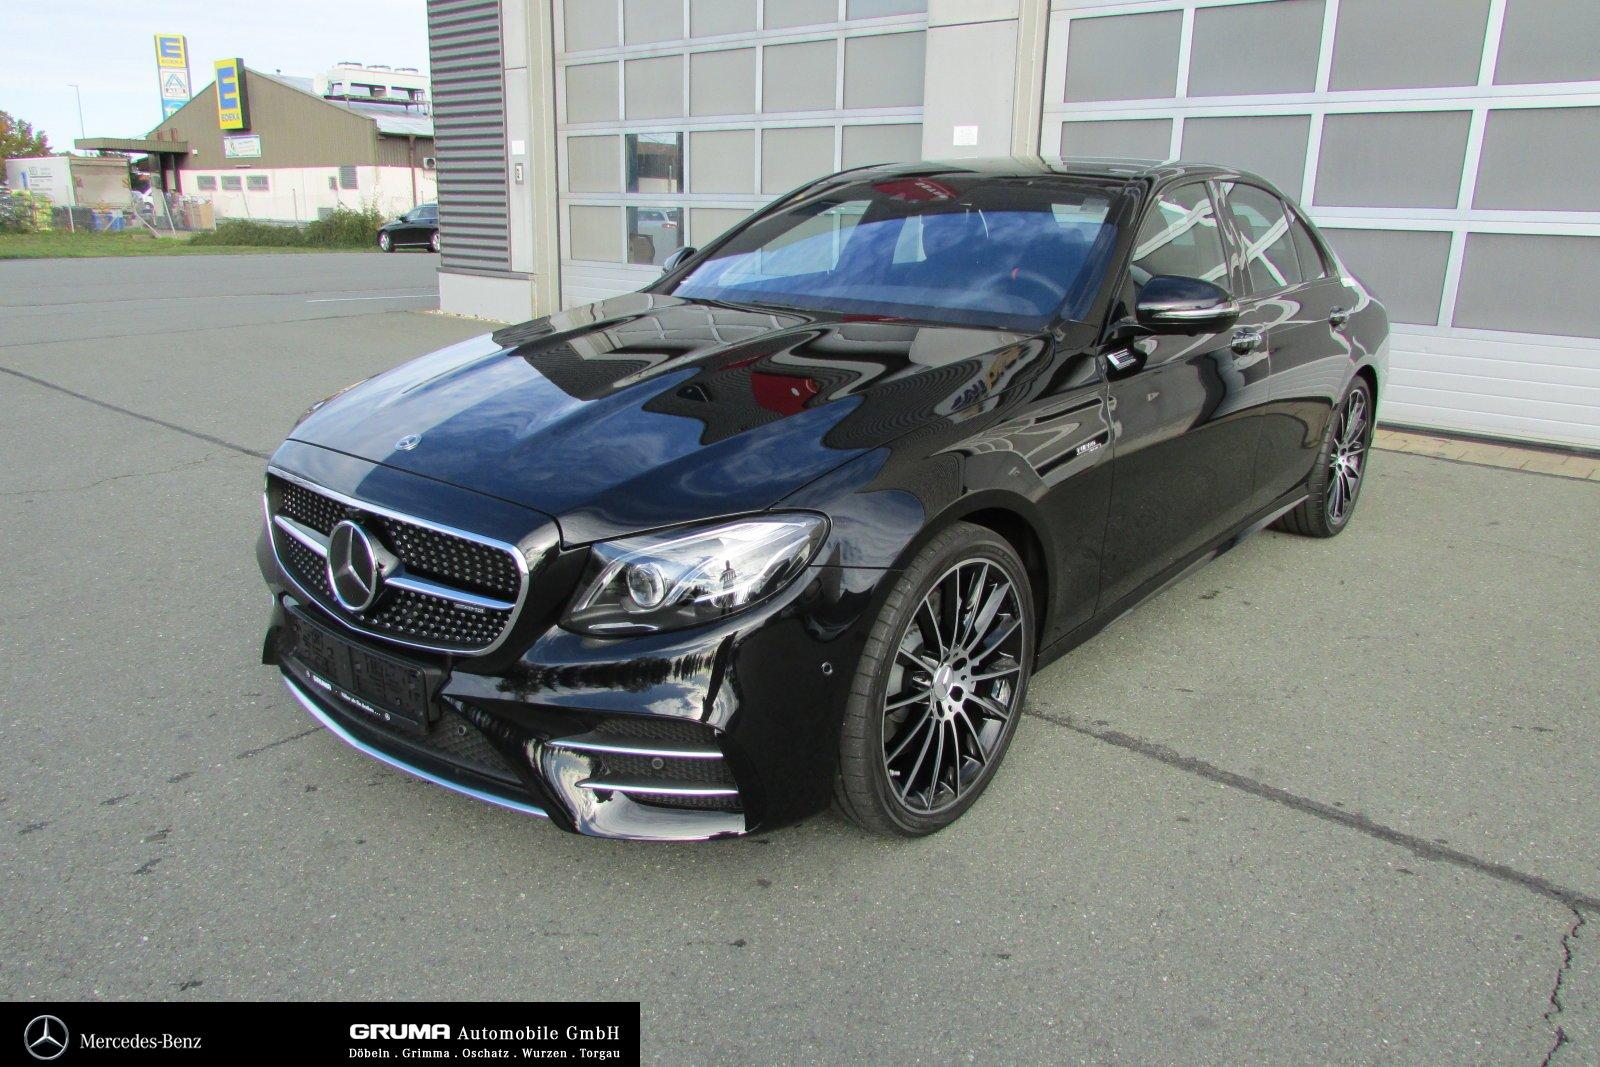 Mercedes-Benz Mercedes-AMG E 53 4M+ +DRIVERSPACKAGE+AHZV+PANO*, Jahr 2019, Benzin